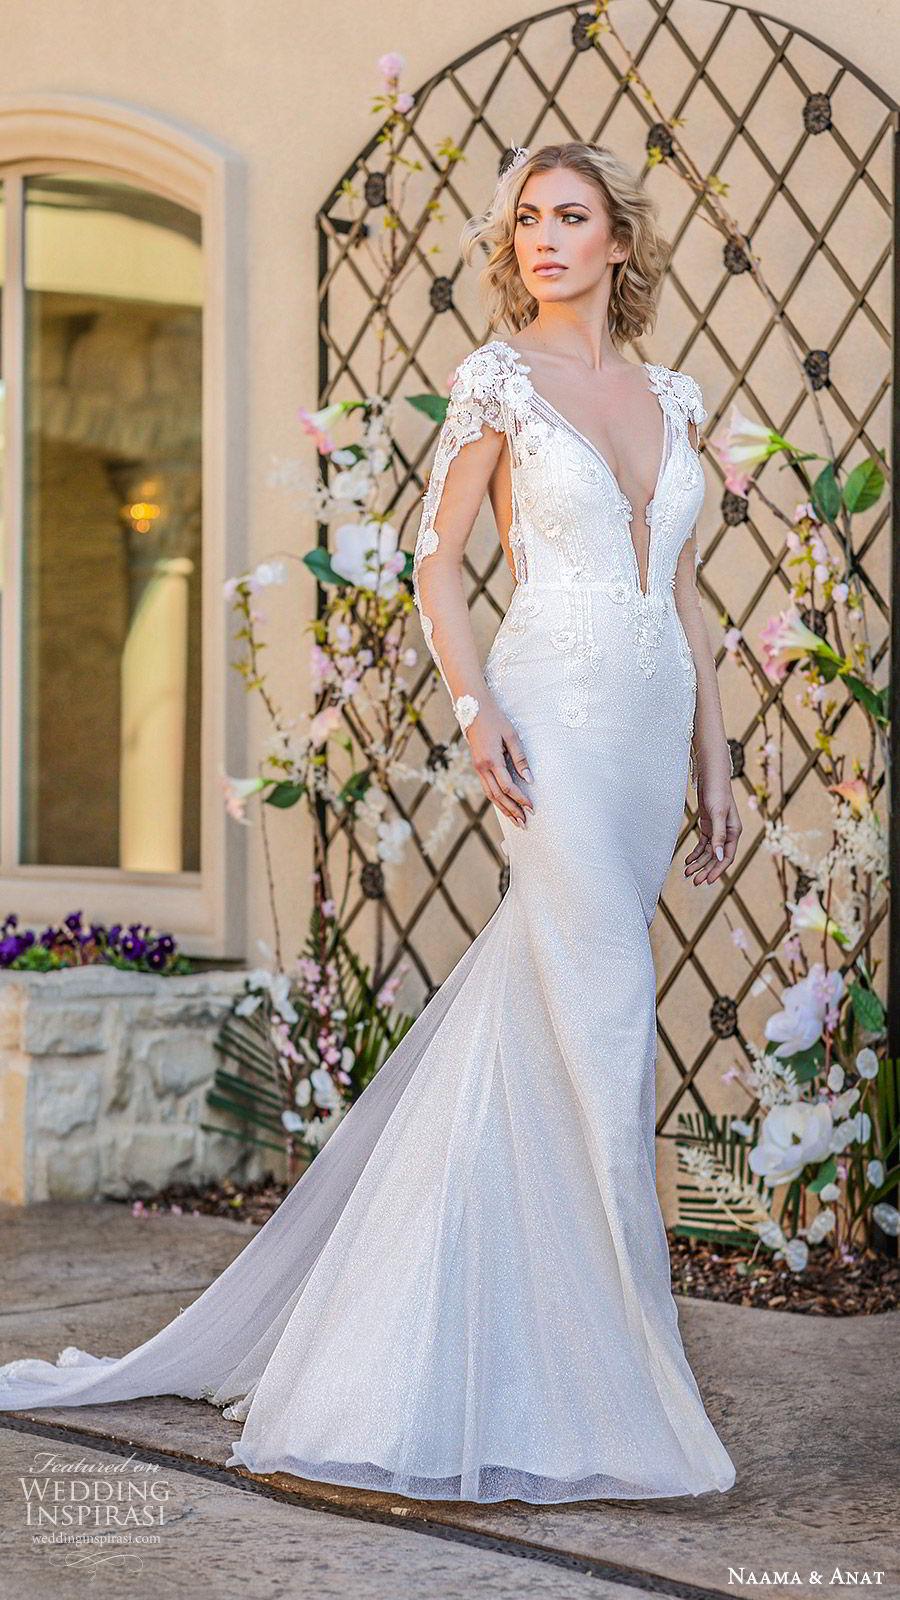 naama anat spring 2020 bridal illusion long sleeves split deep v neckline fully embellished sheath wedding dress (4) sheer back chapel train elegant glam mv